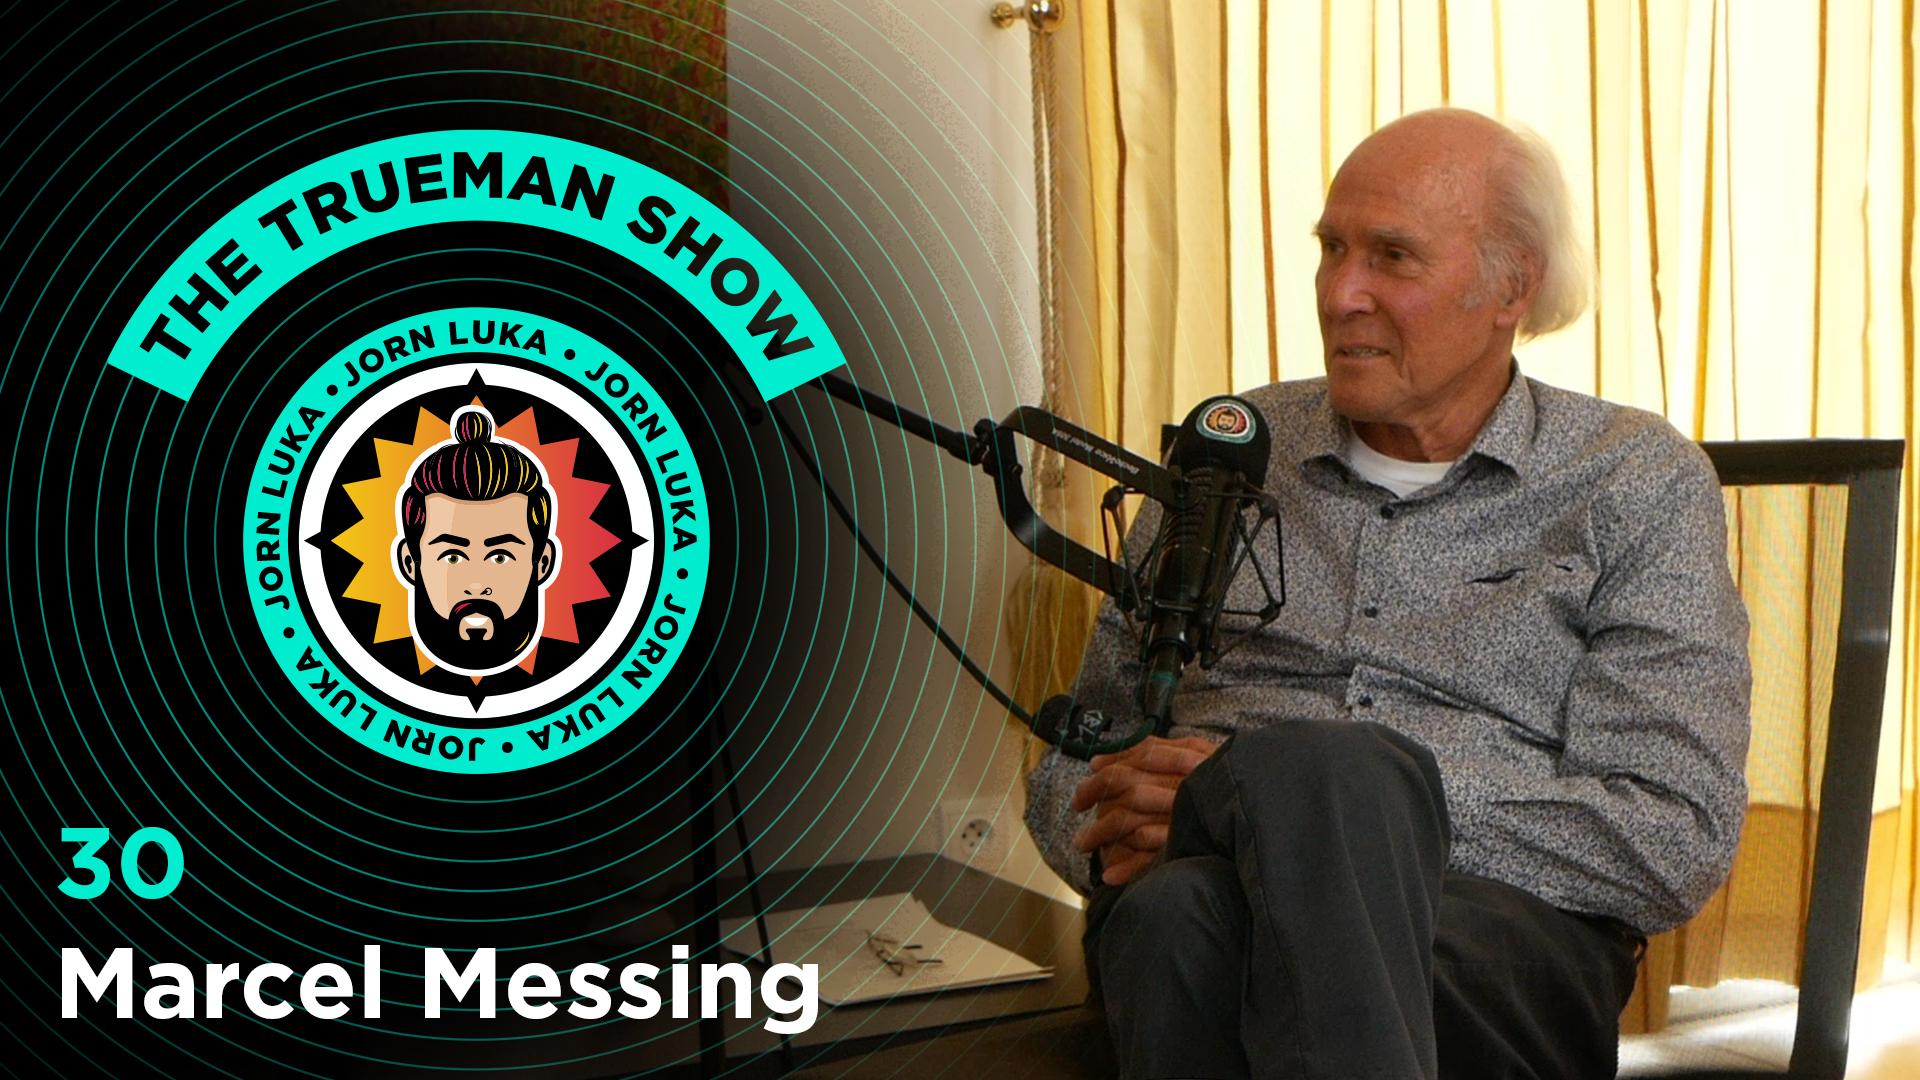 the-trueman-show-#30-marcel-messing